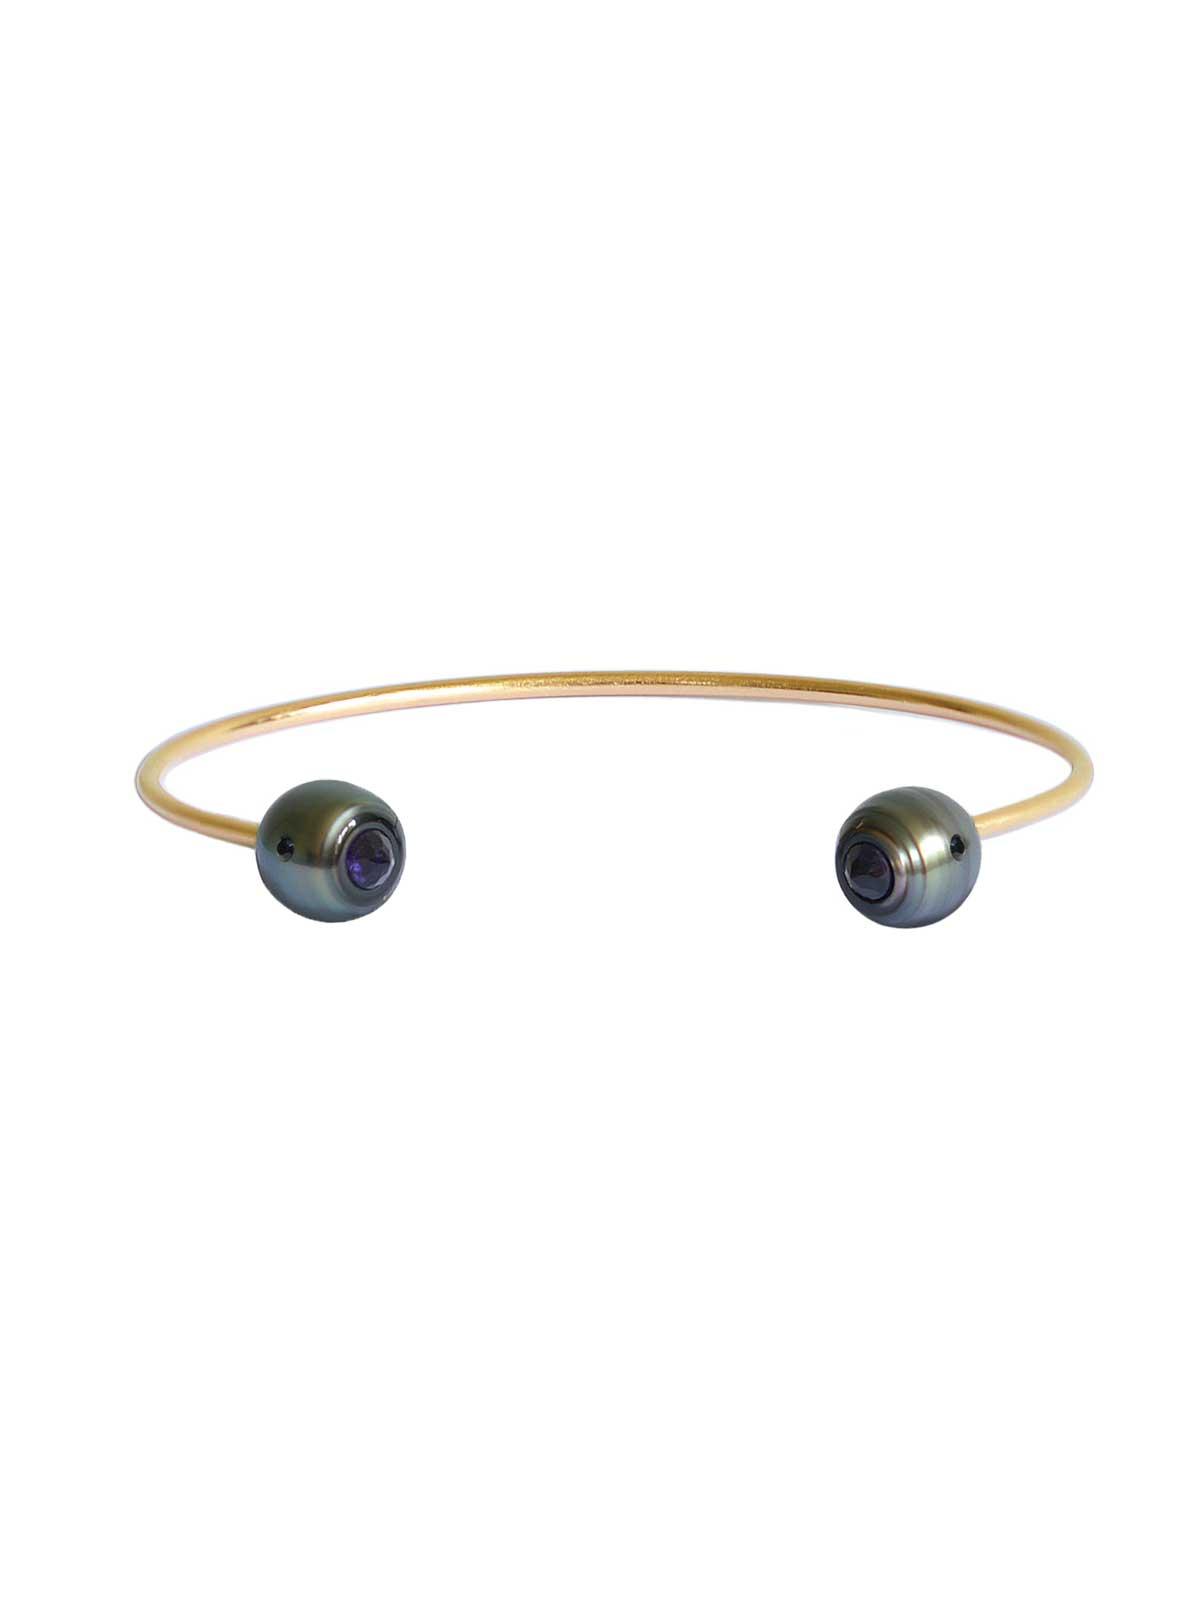 PANTHERE Cuff Bracelet Tahitian Pearl Amethyst Black Diamond